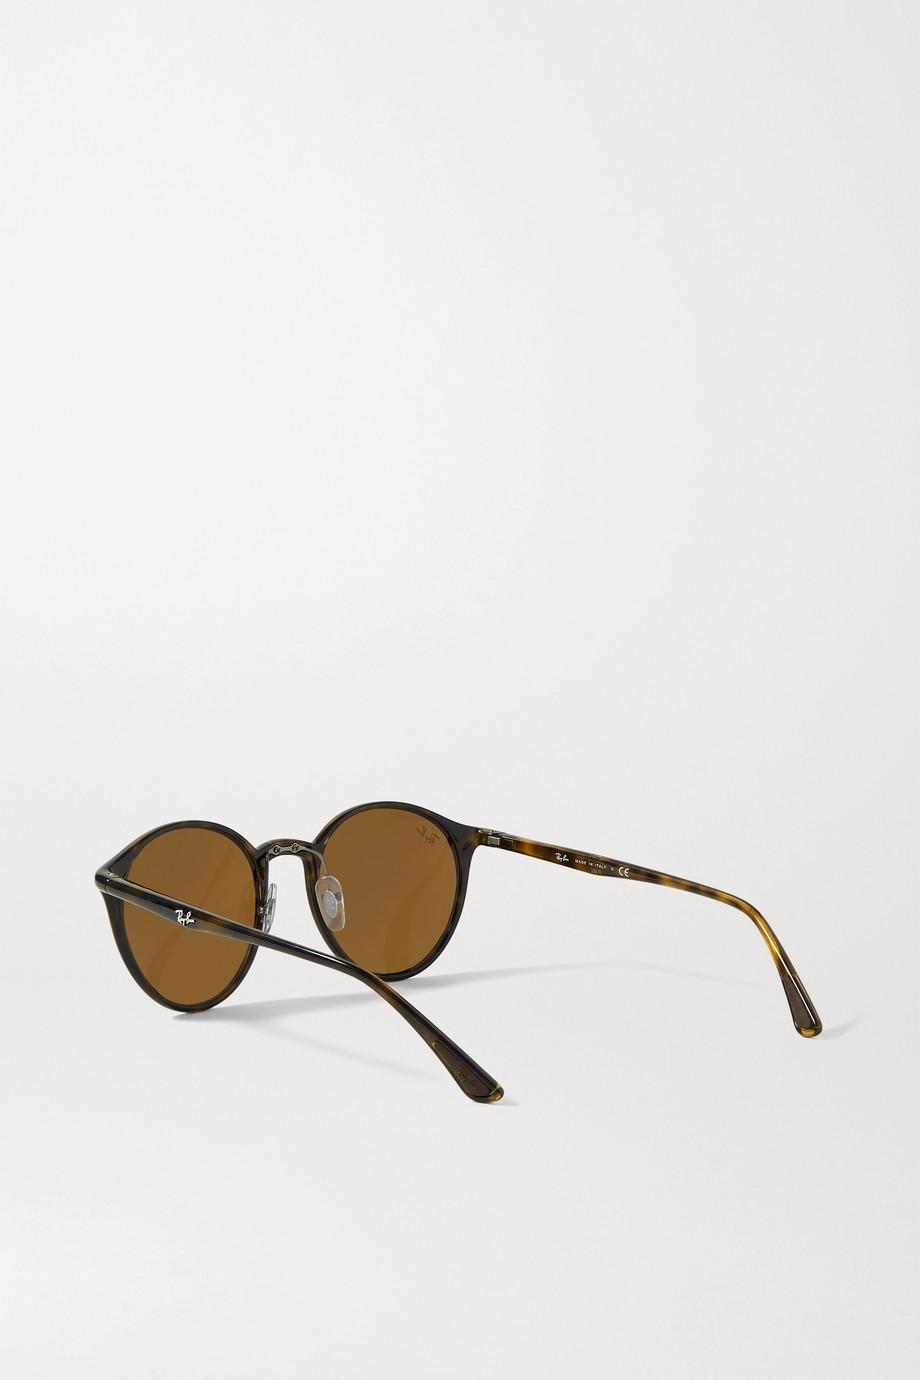 Ray-Ban Round-frame tortoiseshell acetate sunglasses